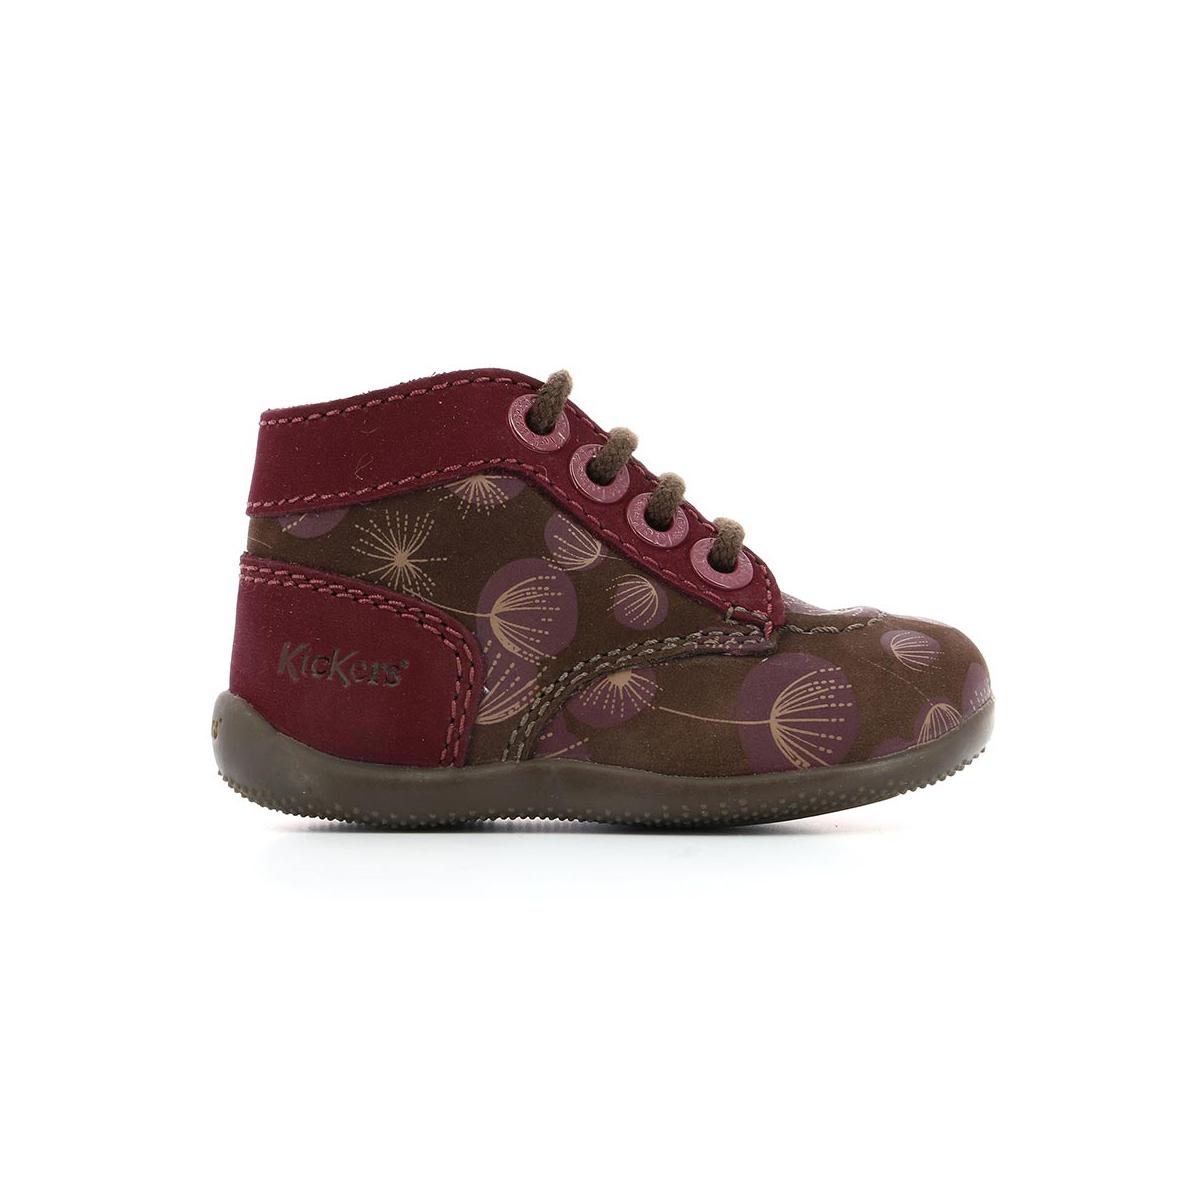 Enfant Marron Herbarium Kickers Bonzip Print Chaussures qZ0xwEAq